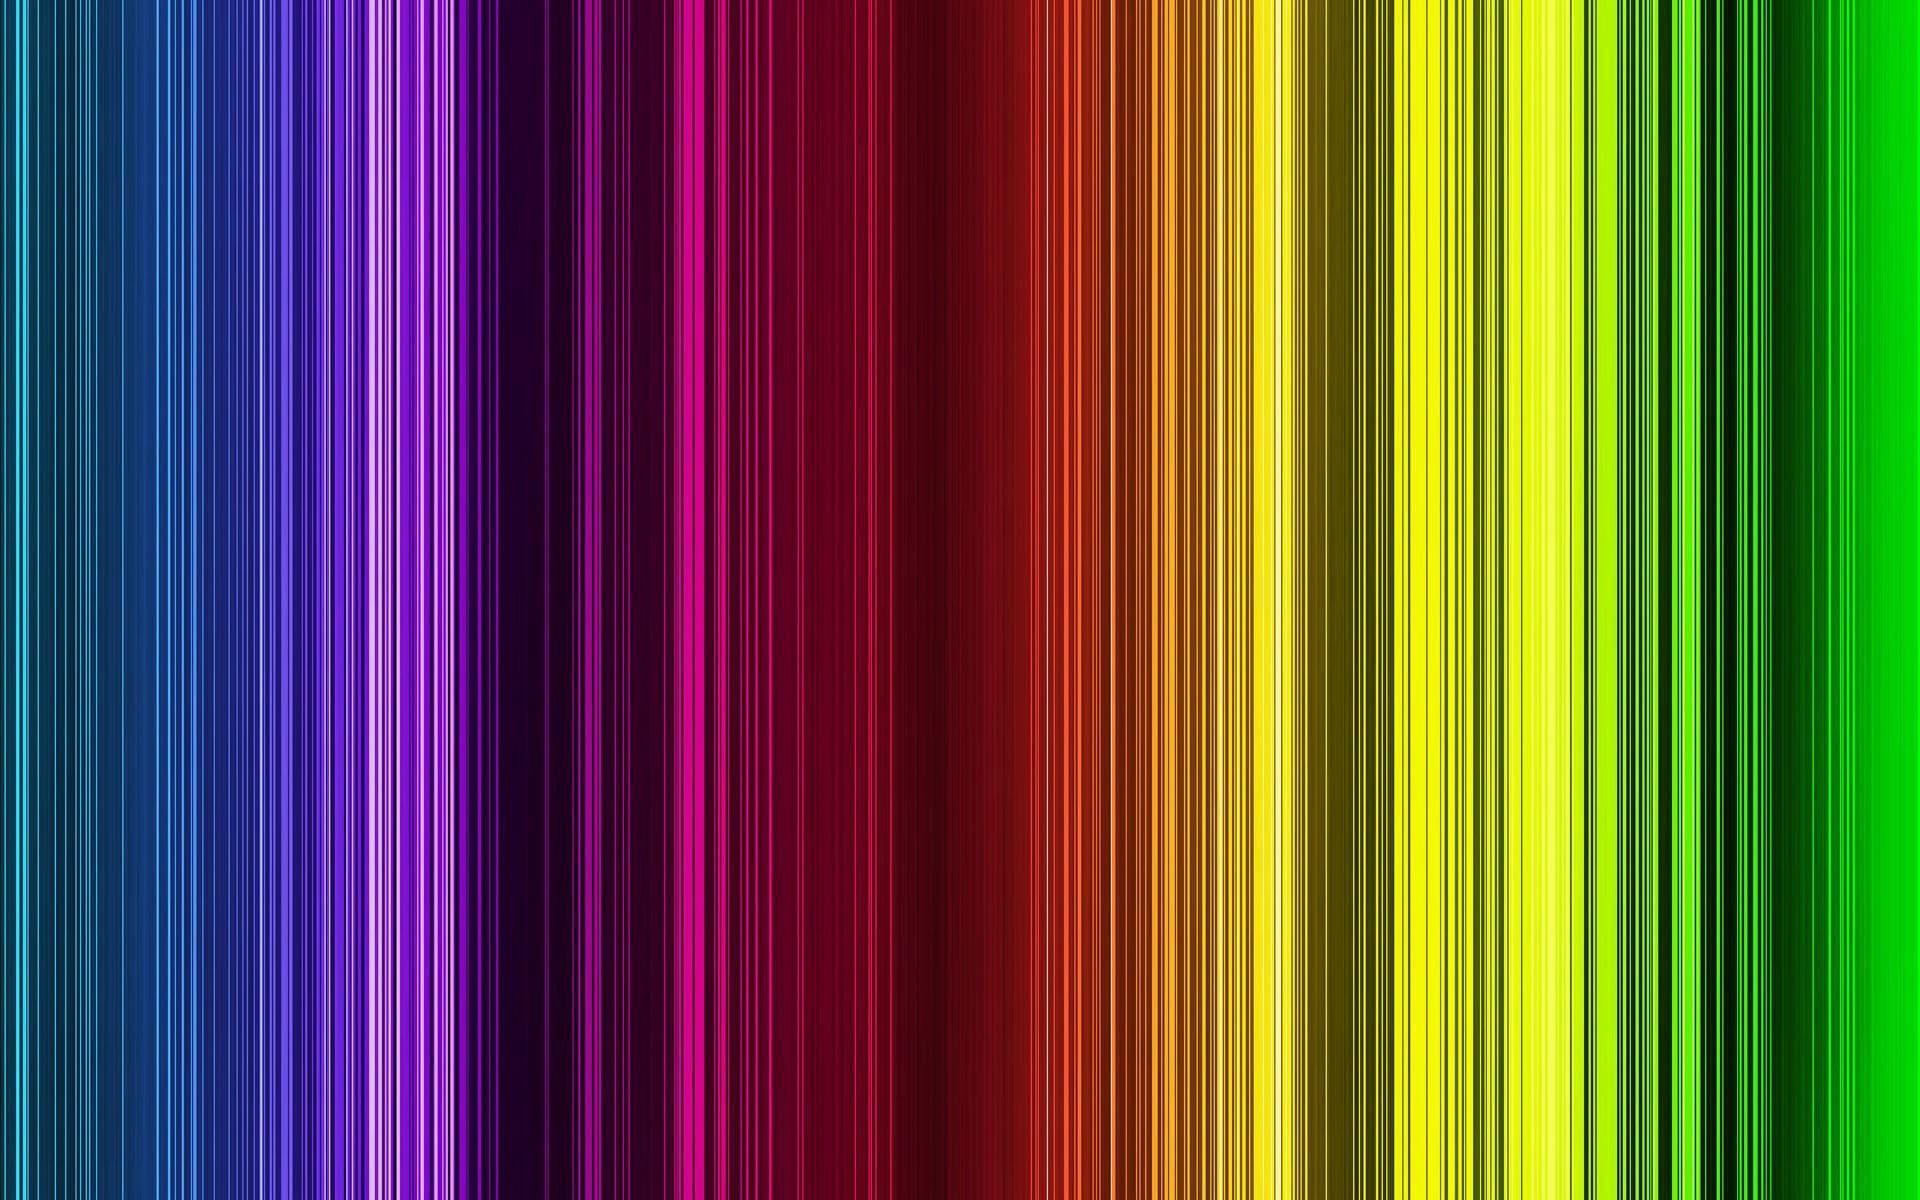 bright colors wallpaper for desktop 53 images